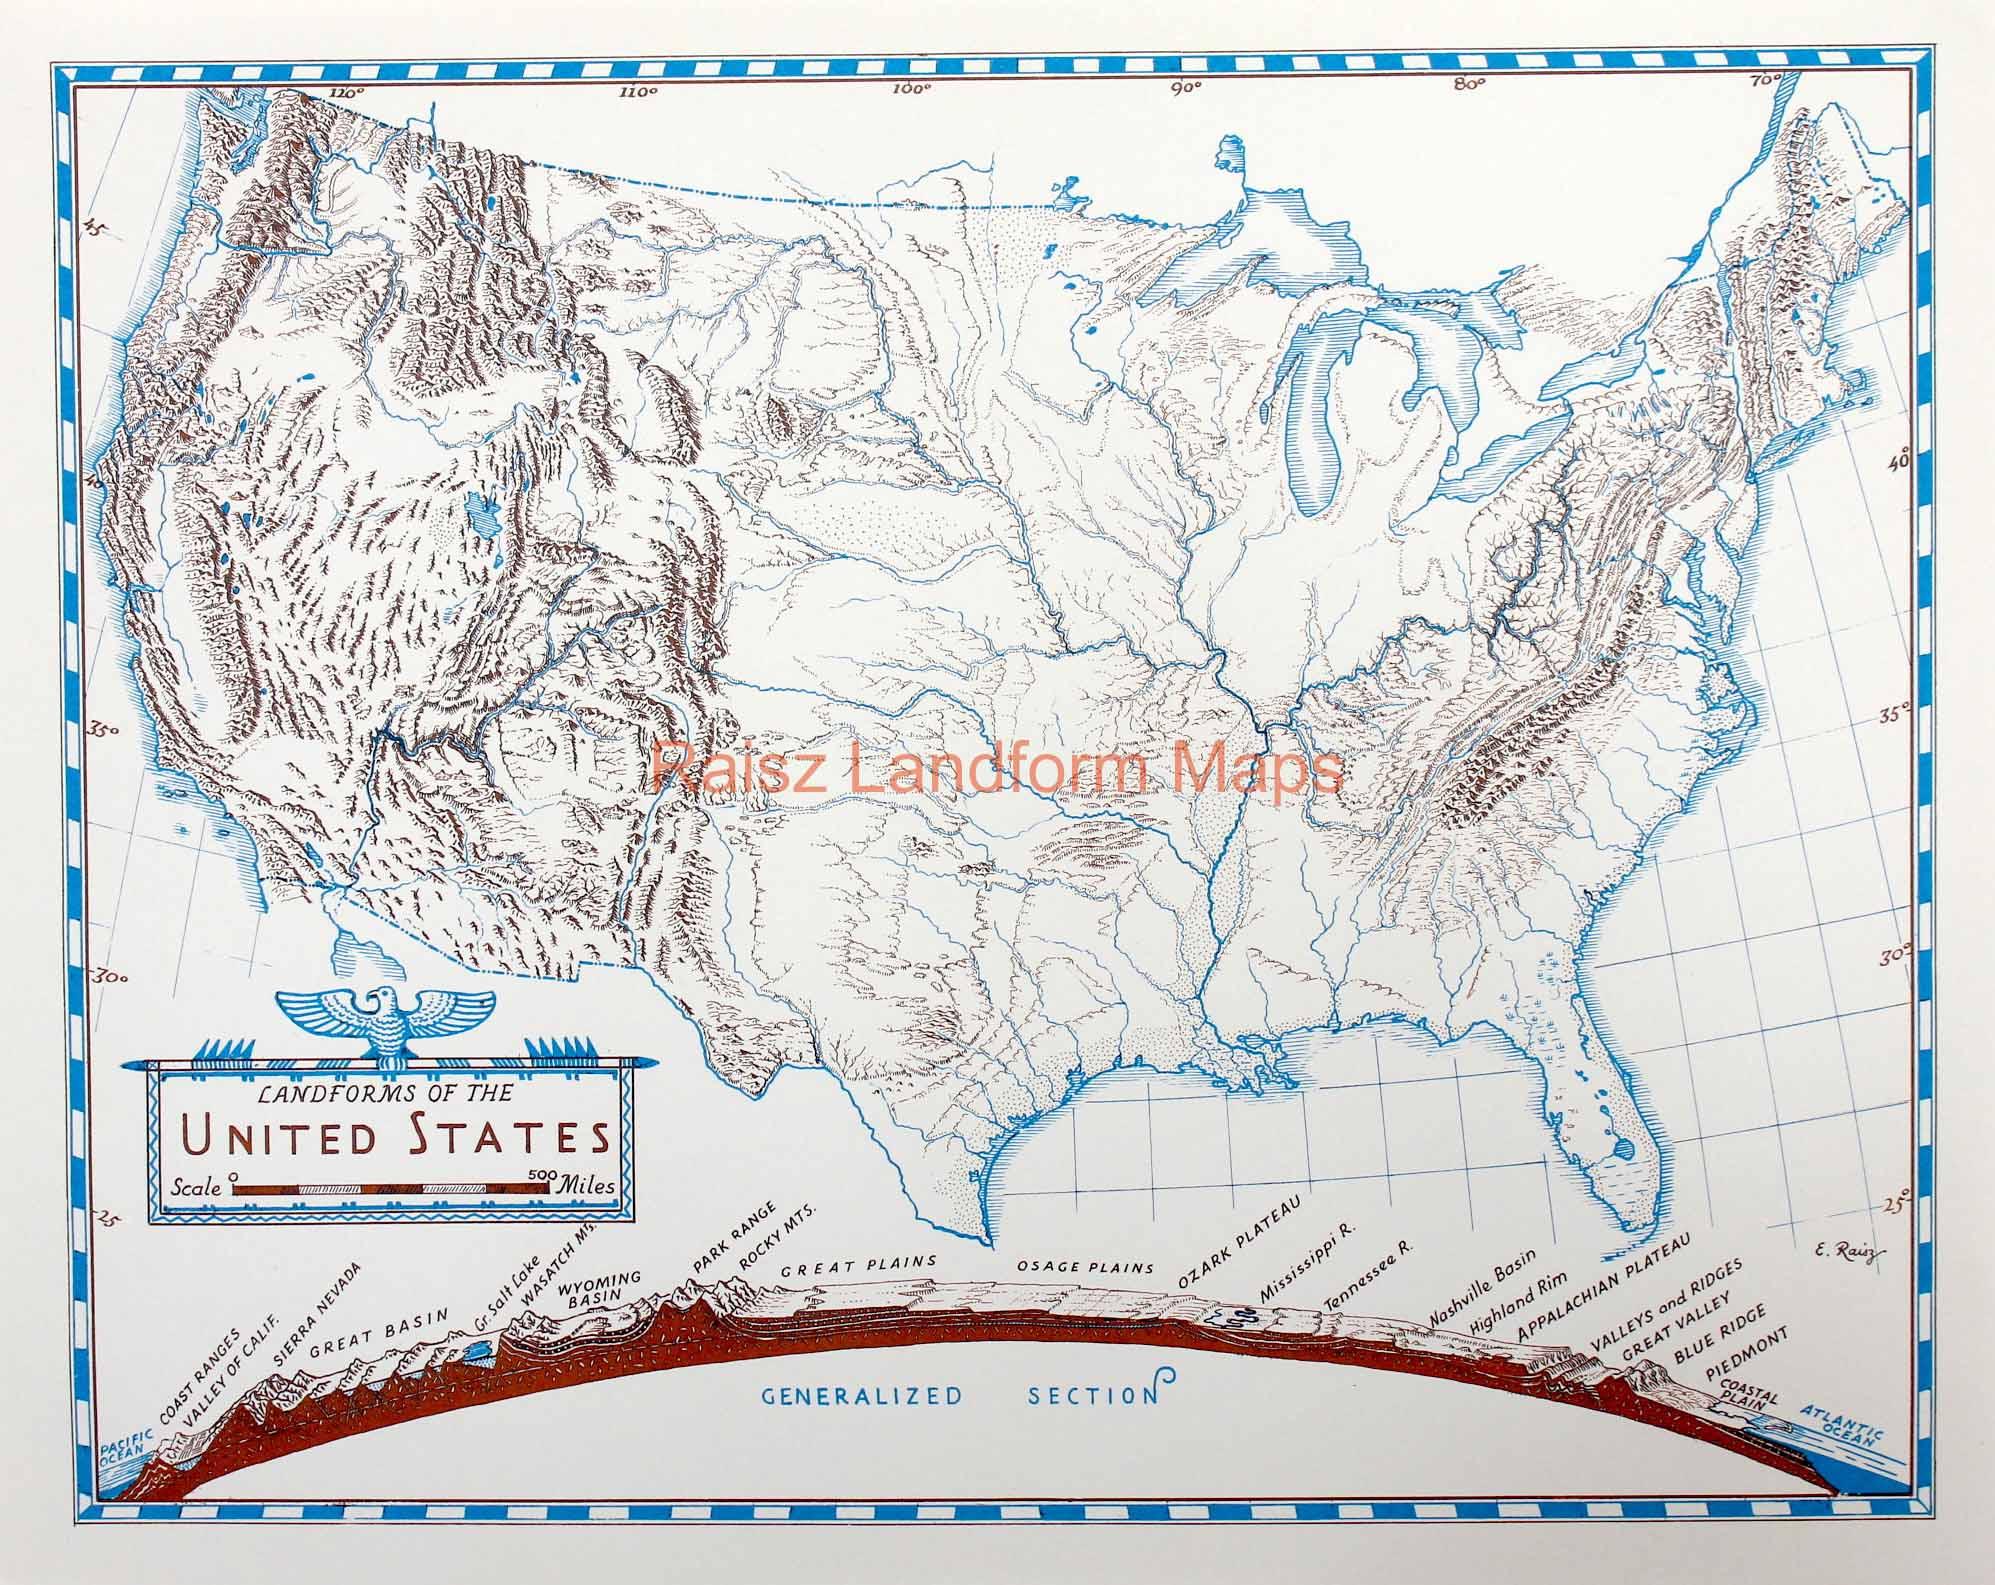 28 United States Map Landforms